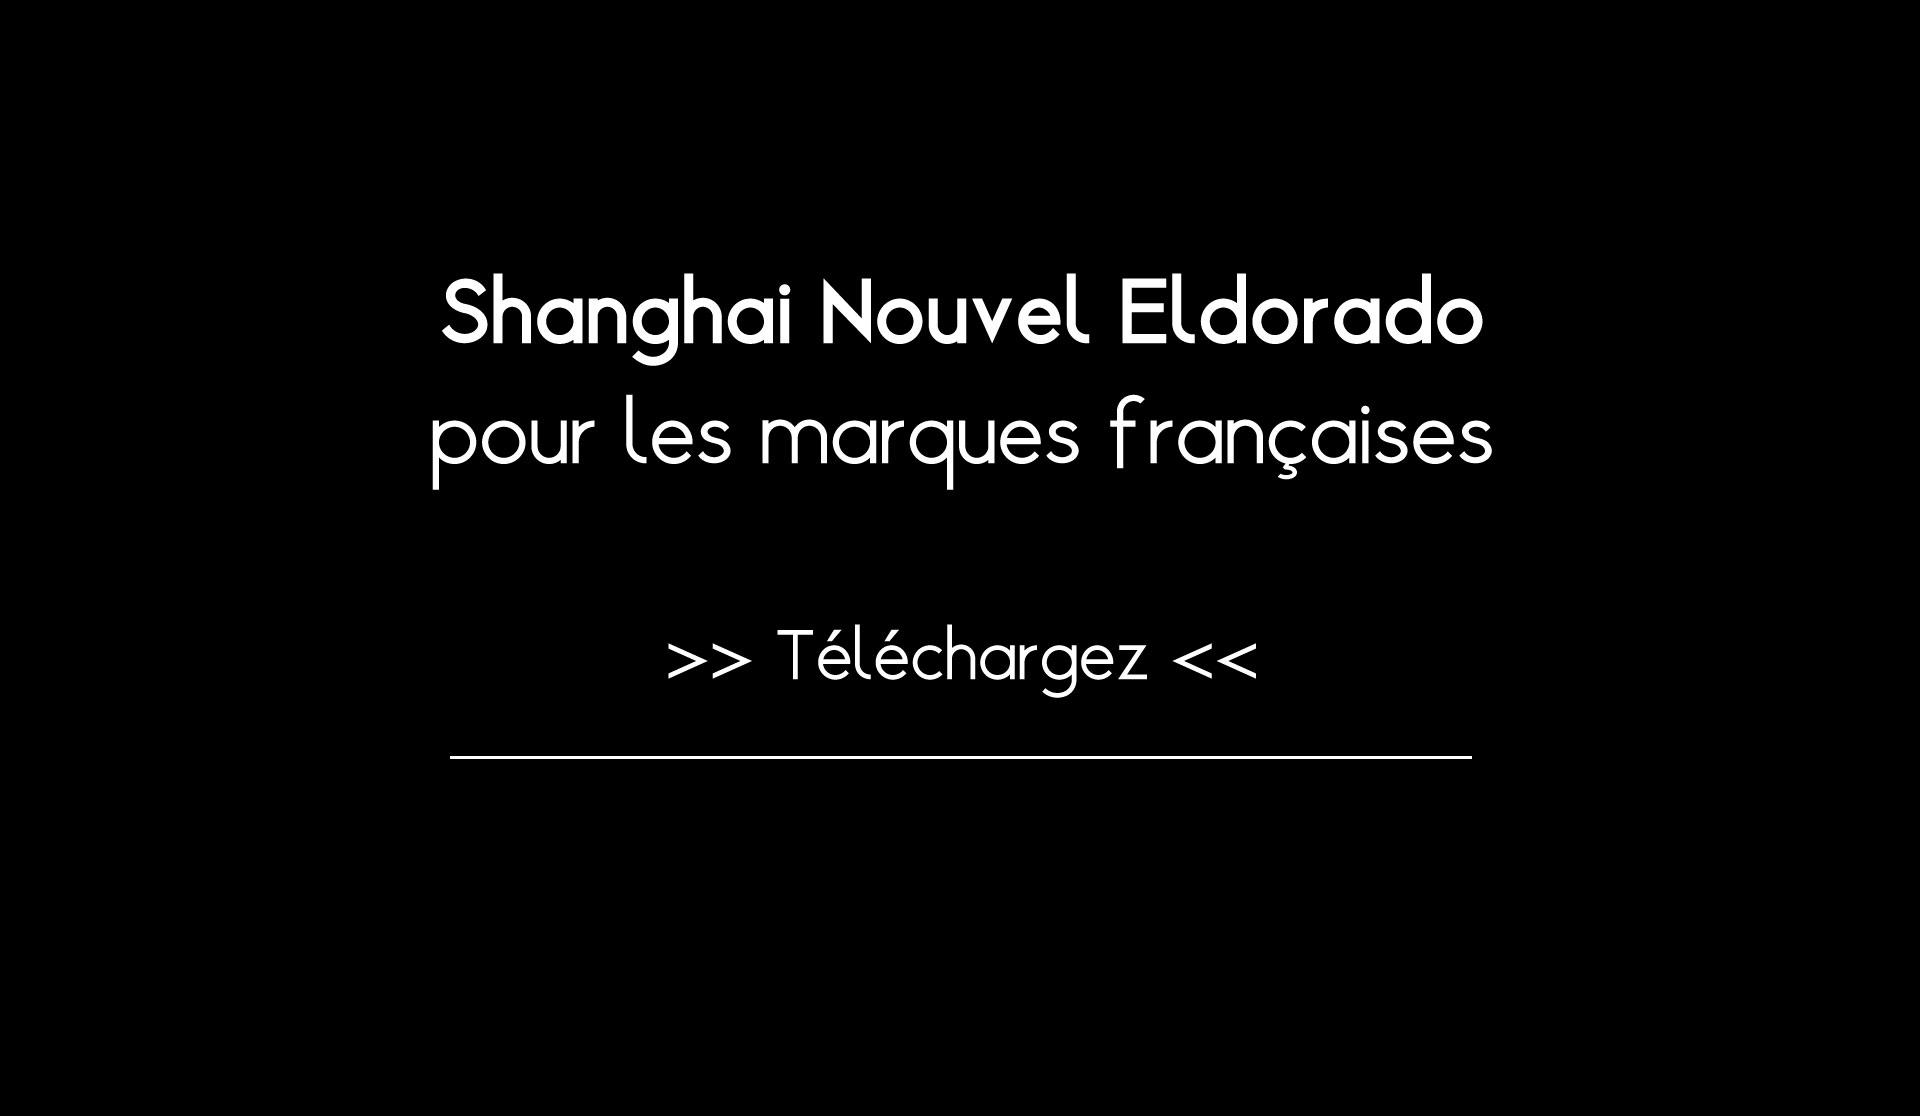 Shangai Nouvel Eldorardo pour les marques françaises : Ebook